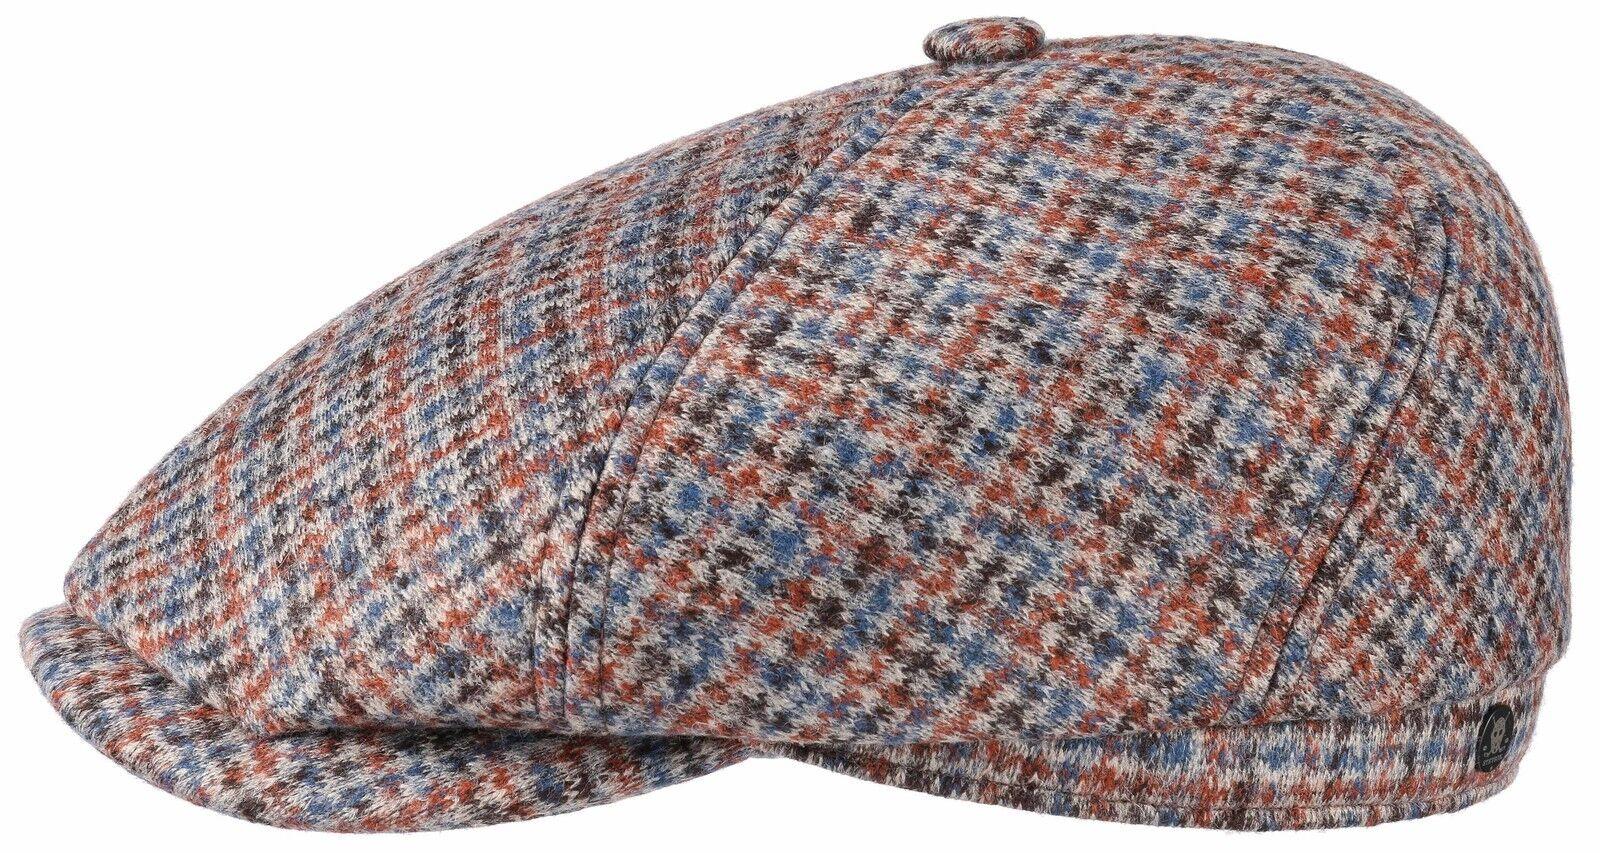 Stetson x Boy Cologne Haie Baker Boy x Flat Cap Cap Oregon BROOKLIN Wool 138 NEW TREND 74247a